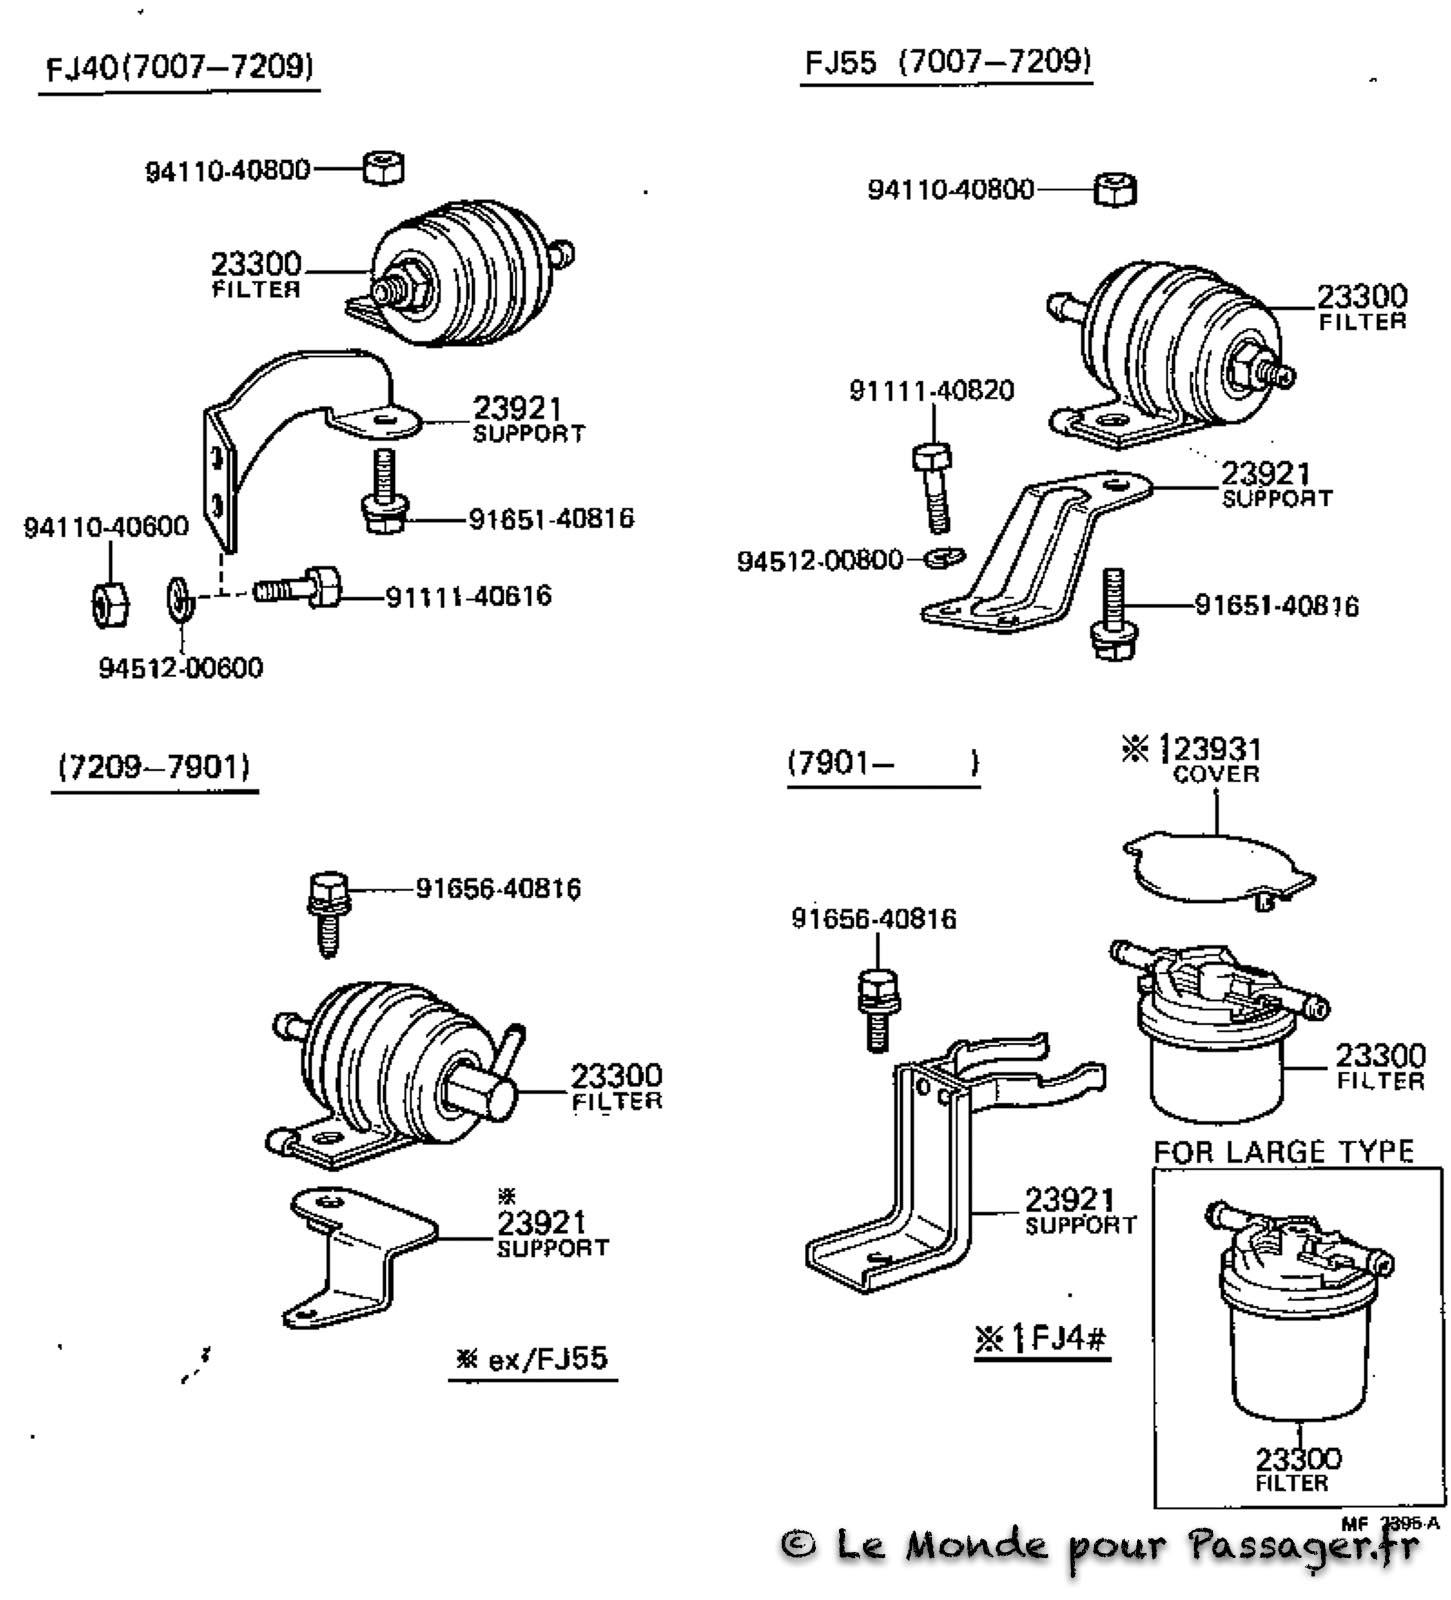 Fj55-Eclatés-Techniques016